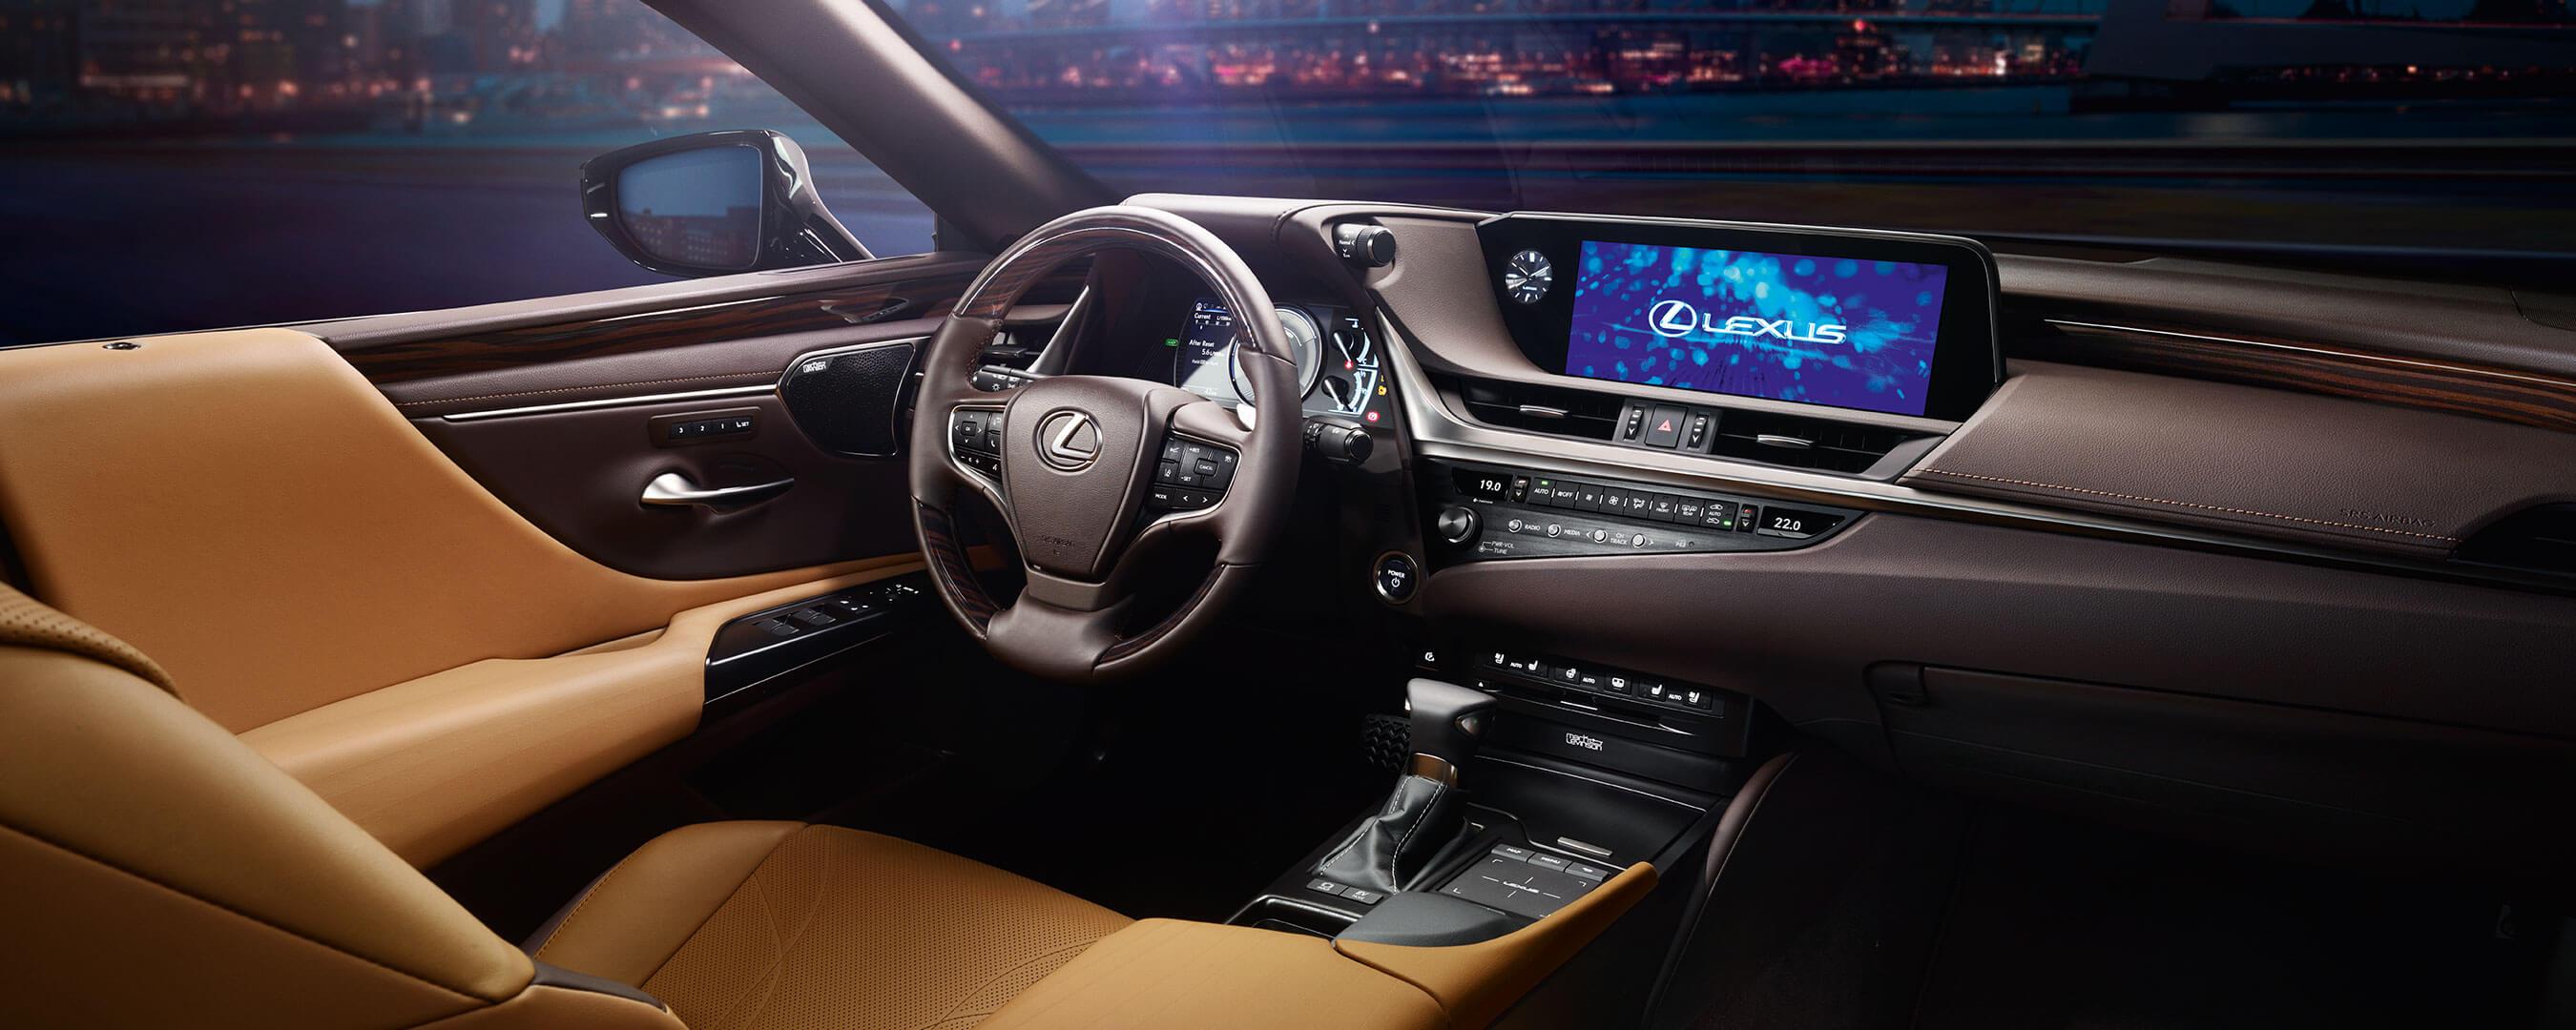 2019 Lexus Es Hybrid Experience Hero Interior Front